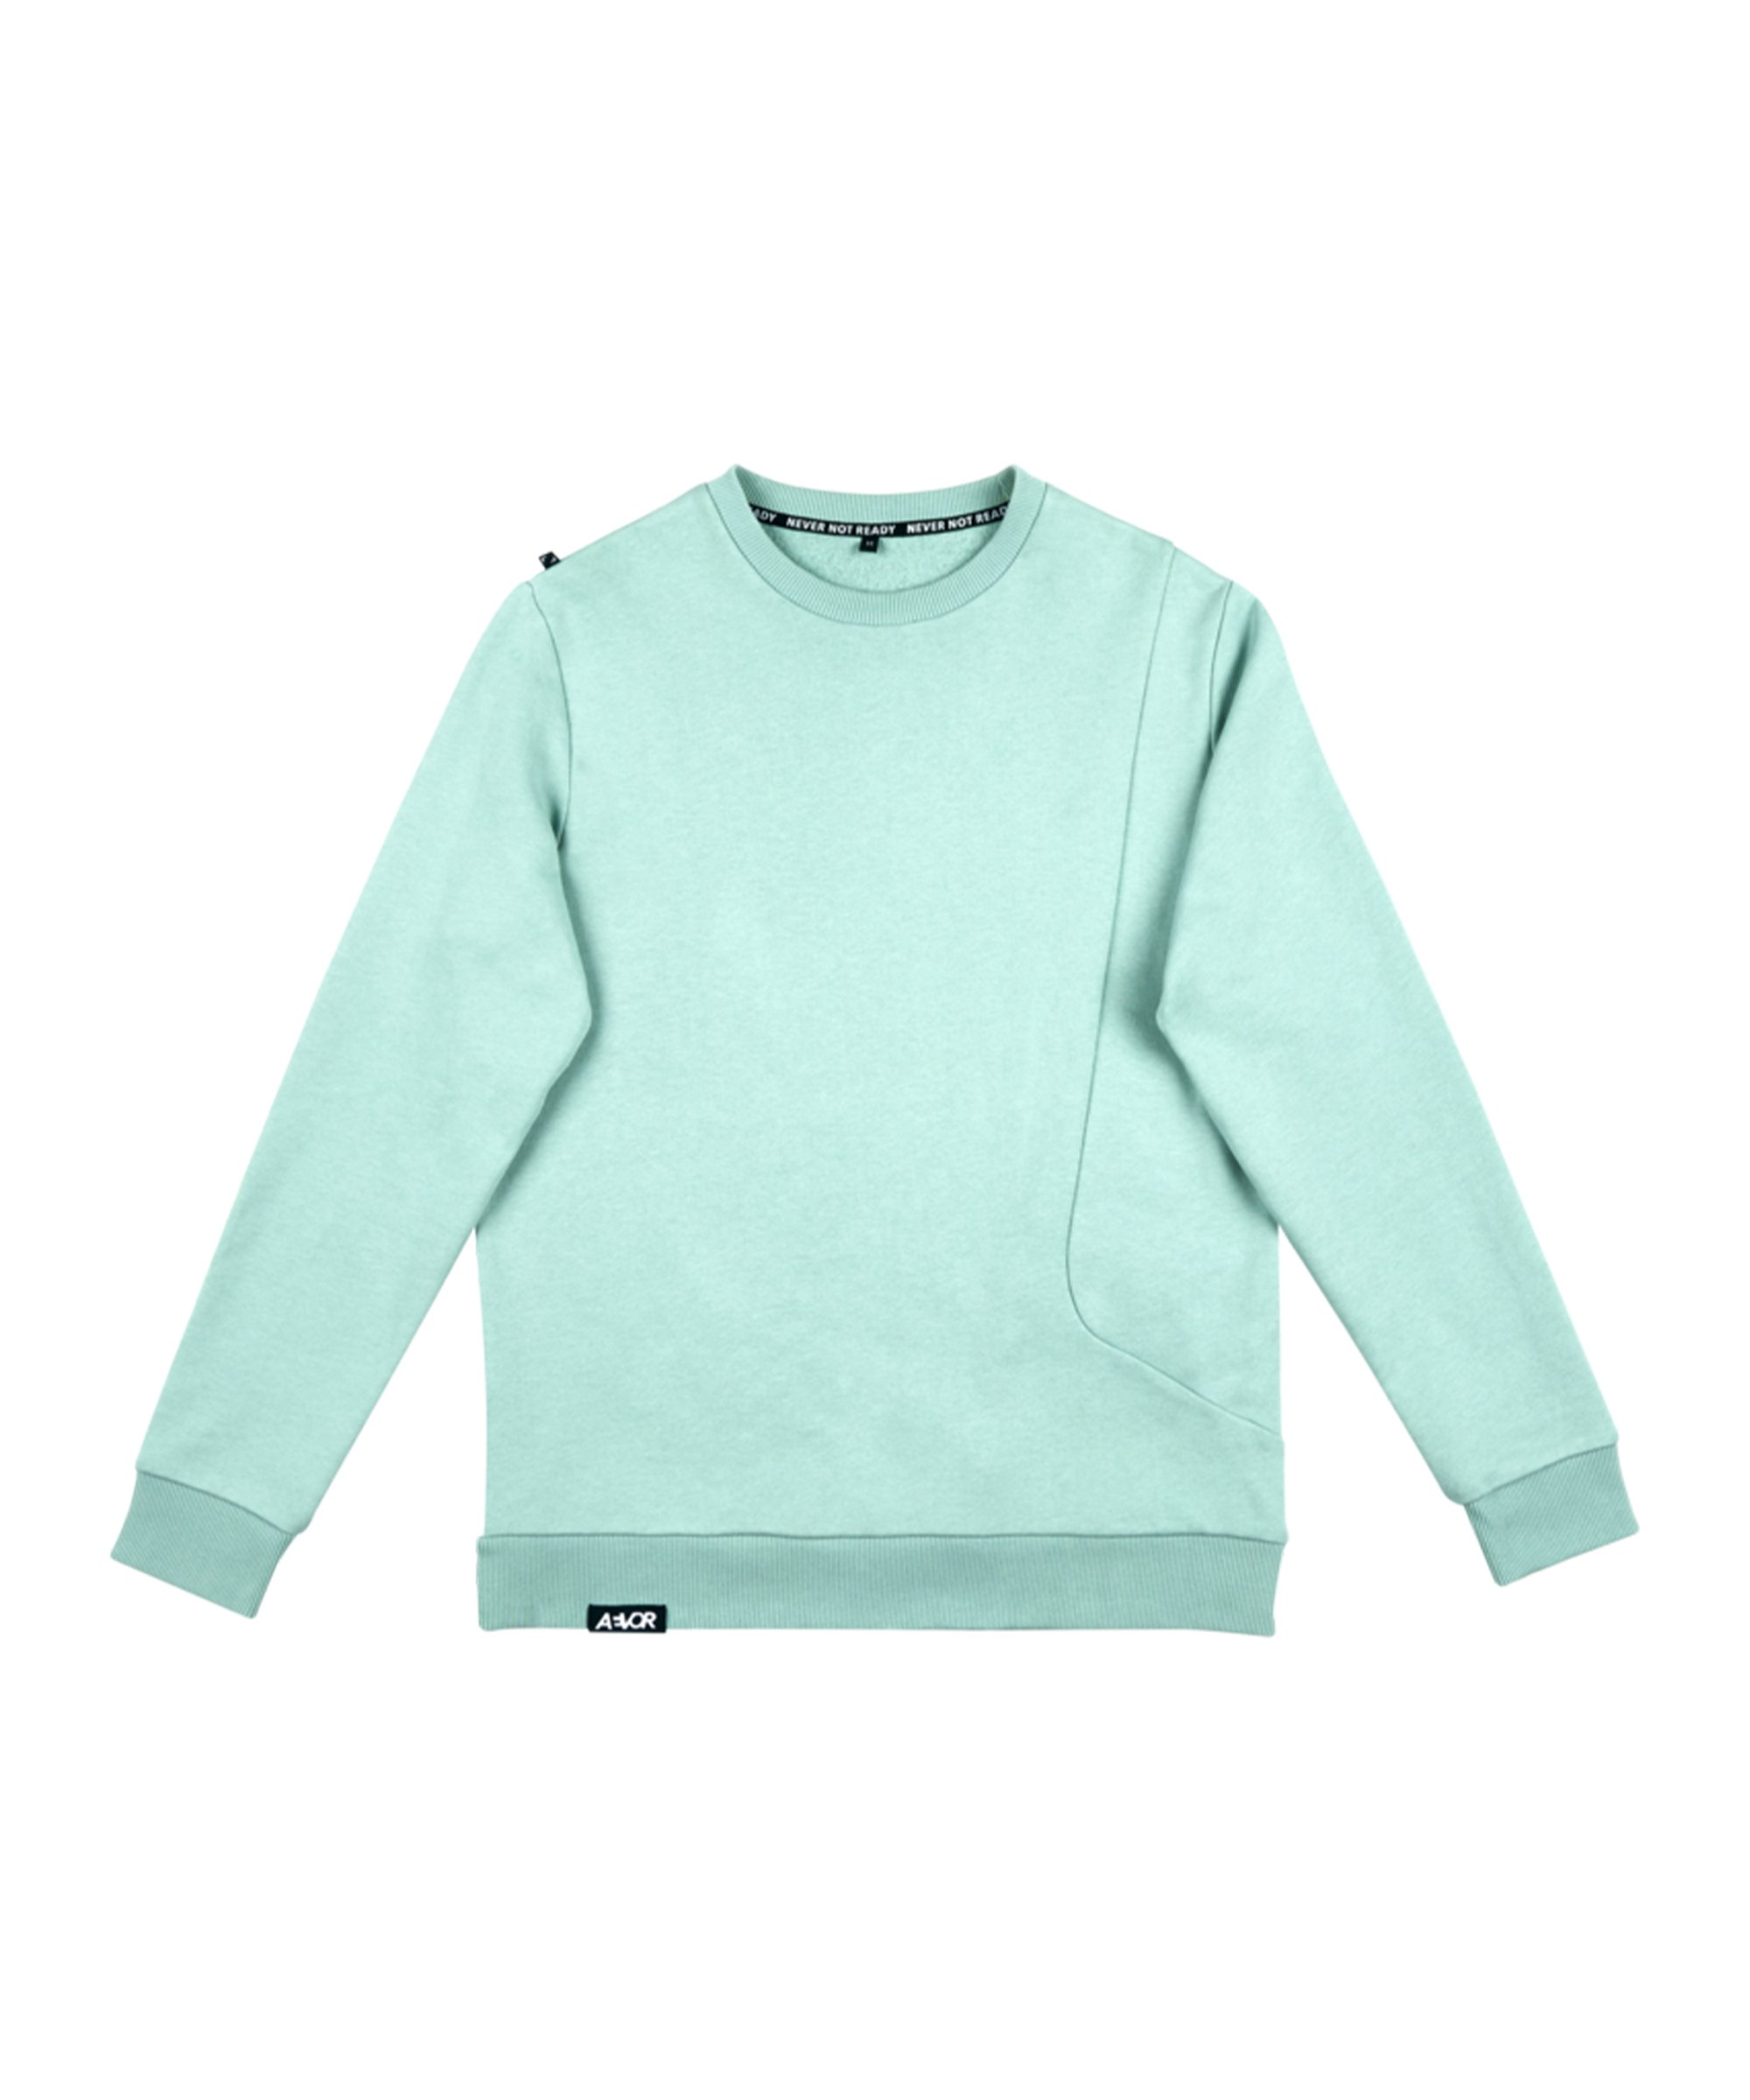 AEVOR Pocket Sweatshirt Blau F20078 - gruen